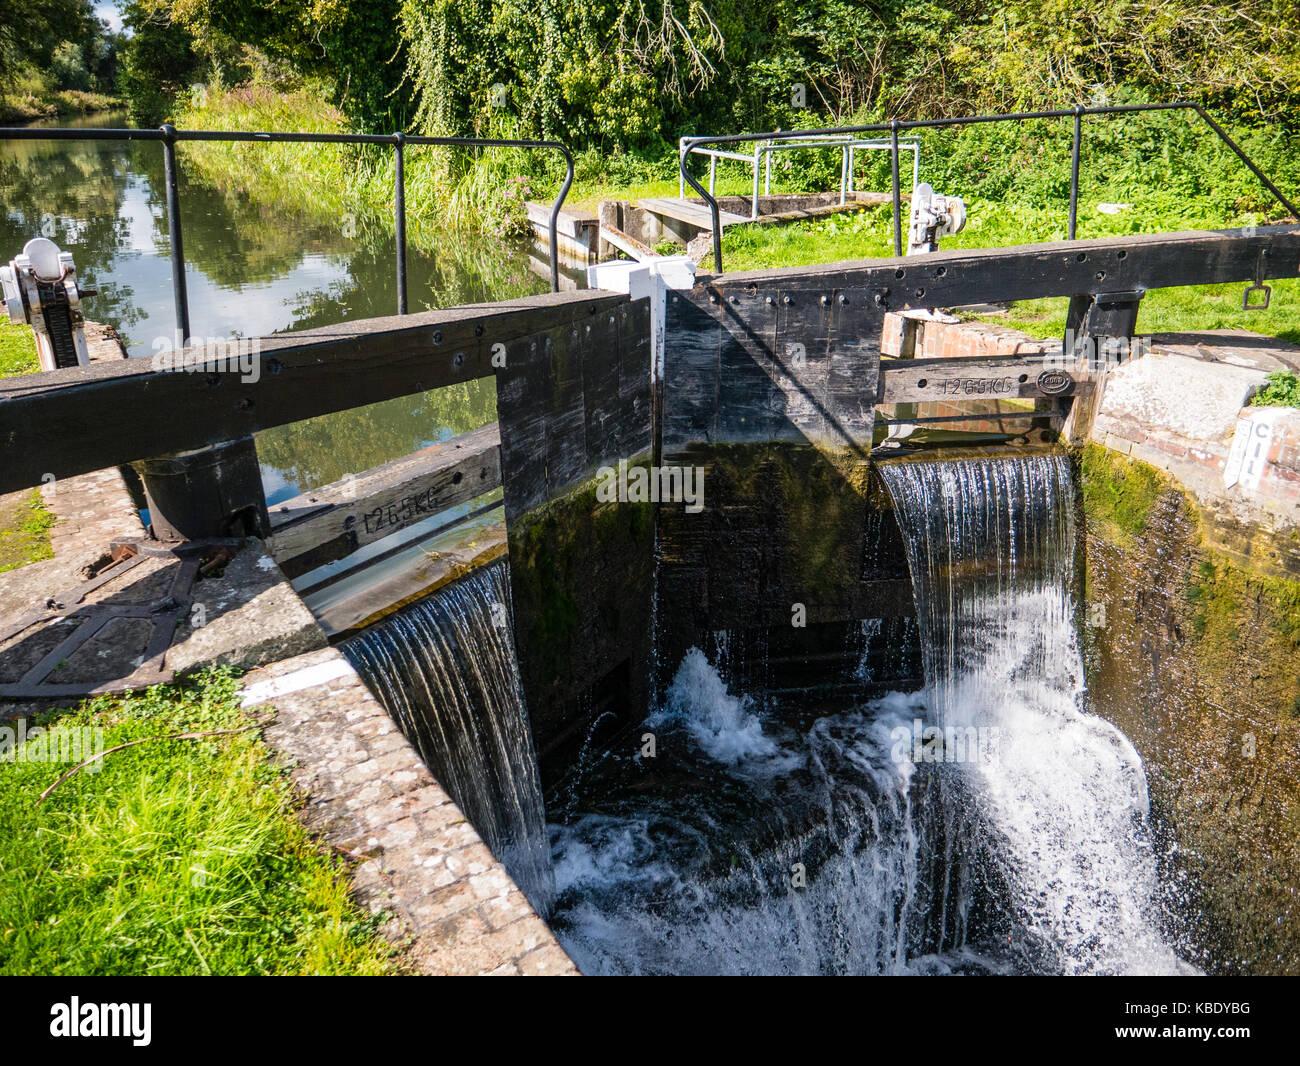 Garston Lock, River Kennet, Thale, Berkshire, England - Stock Image